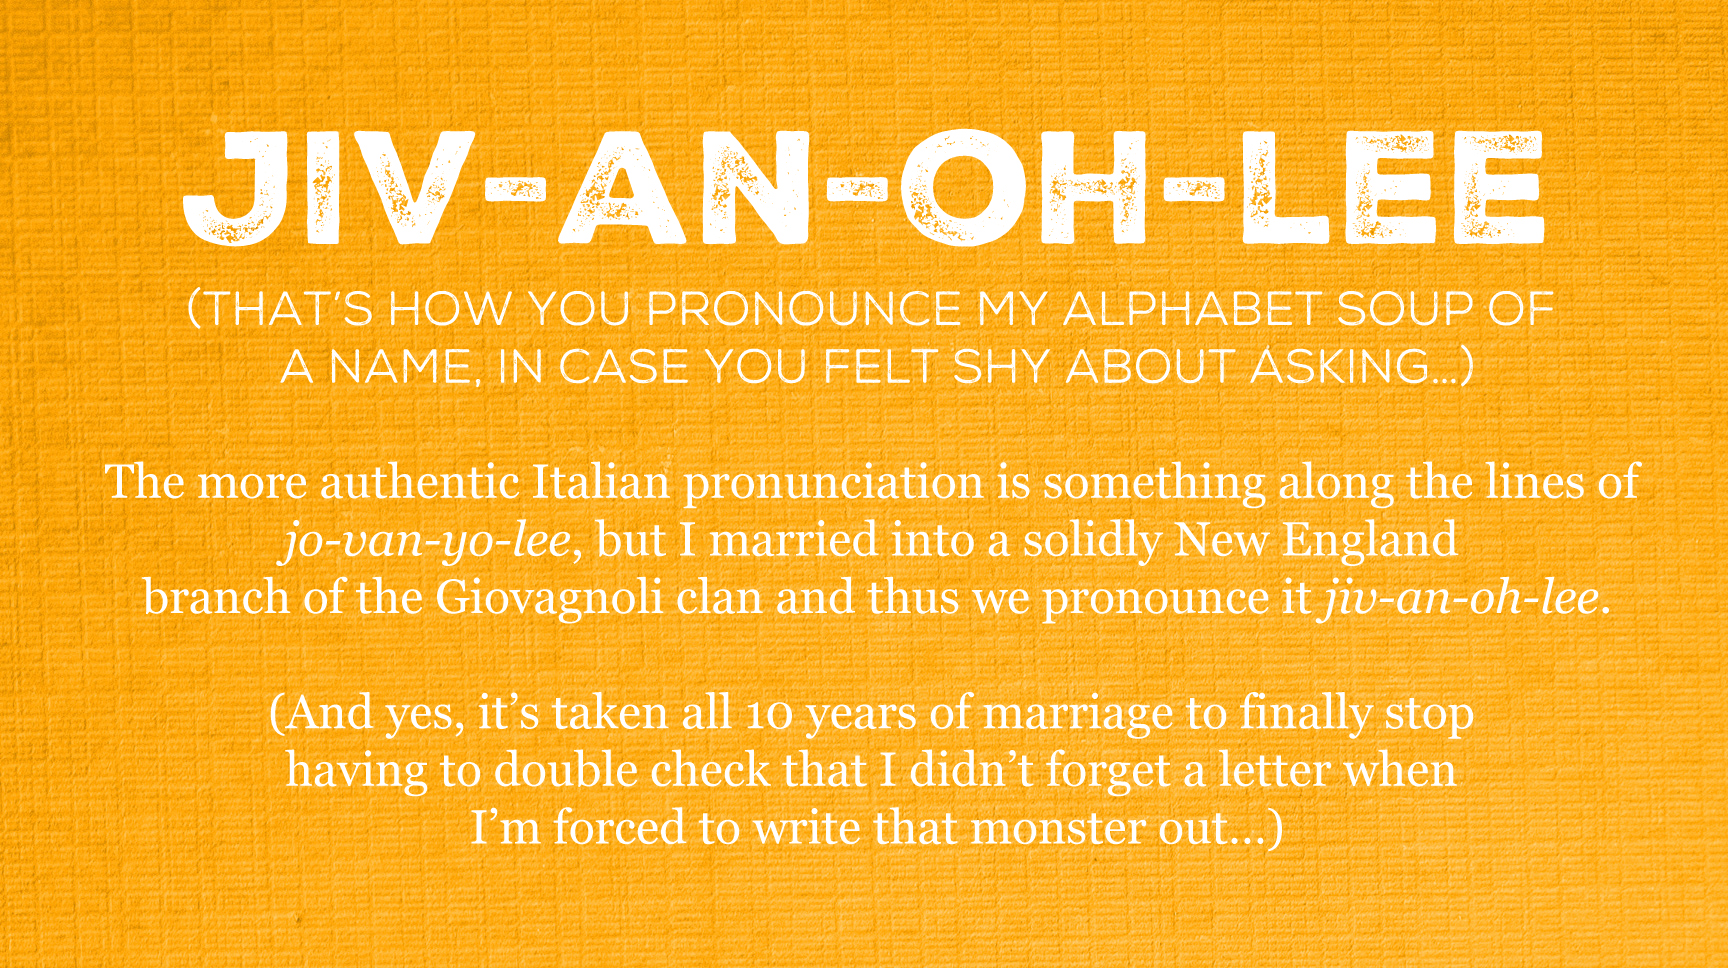 Name_pronunciation.jpg